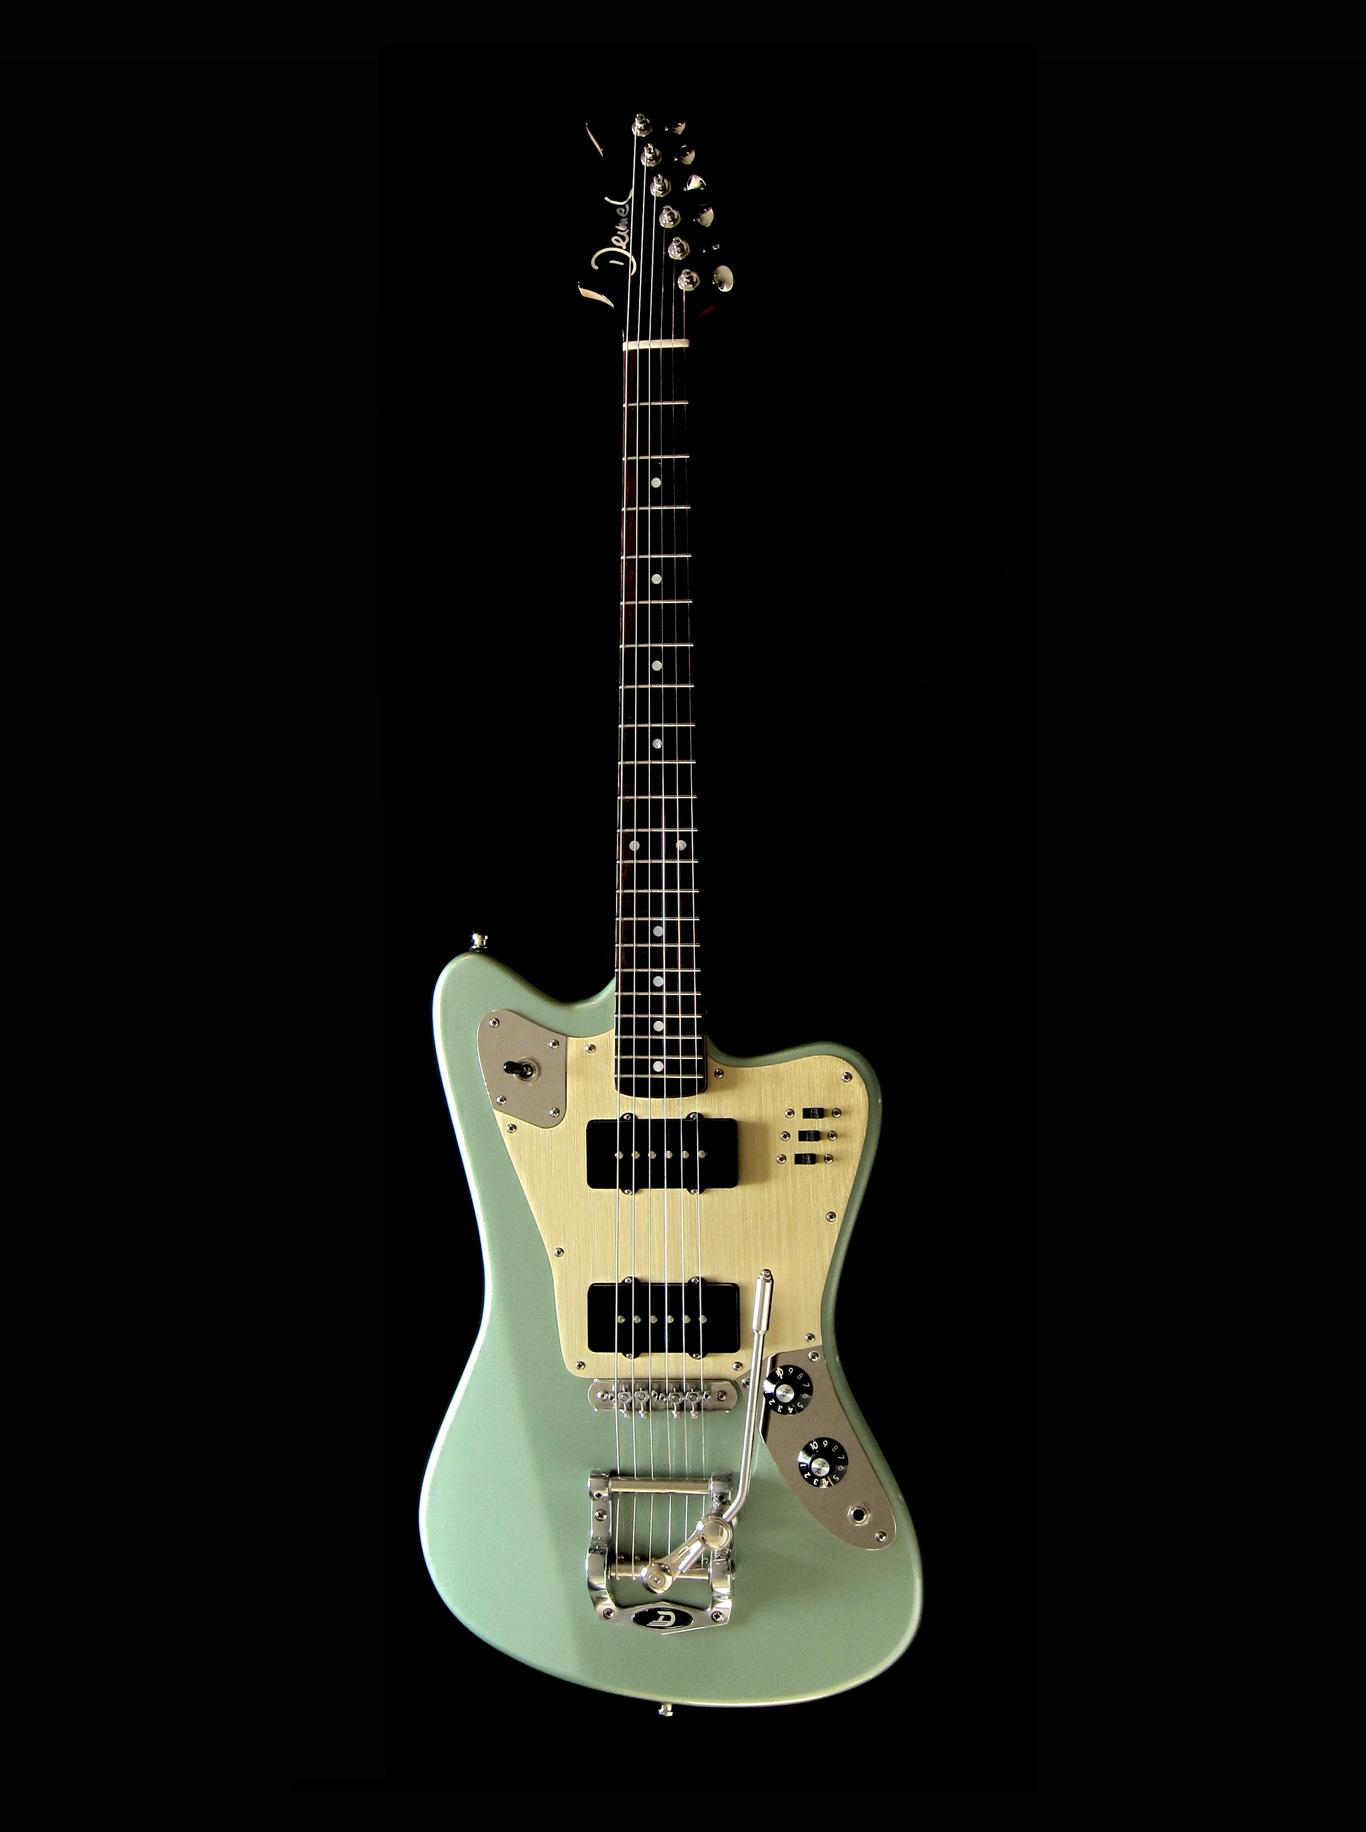 Deimel Firestar »Classic«, Color »Venus Fern Green«